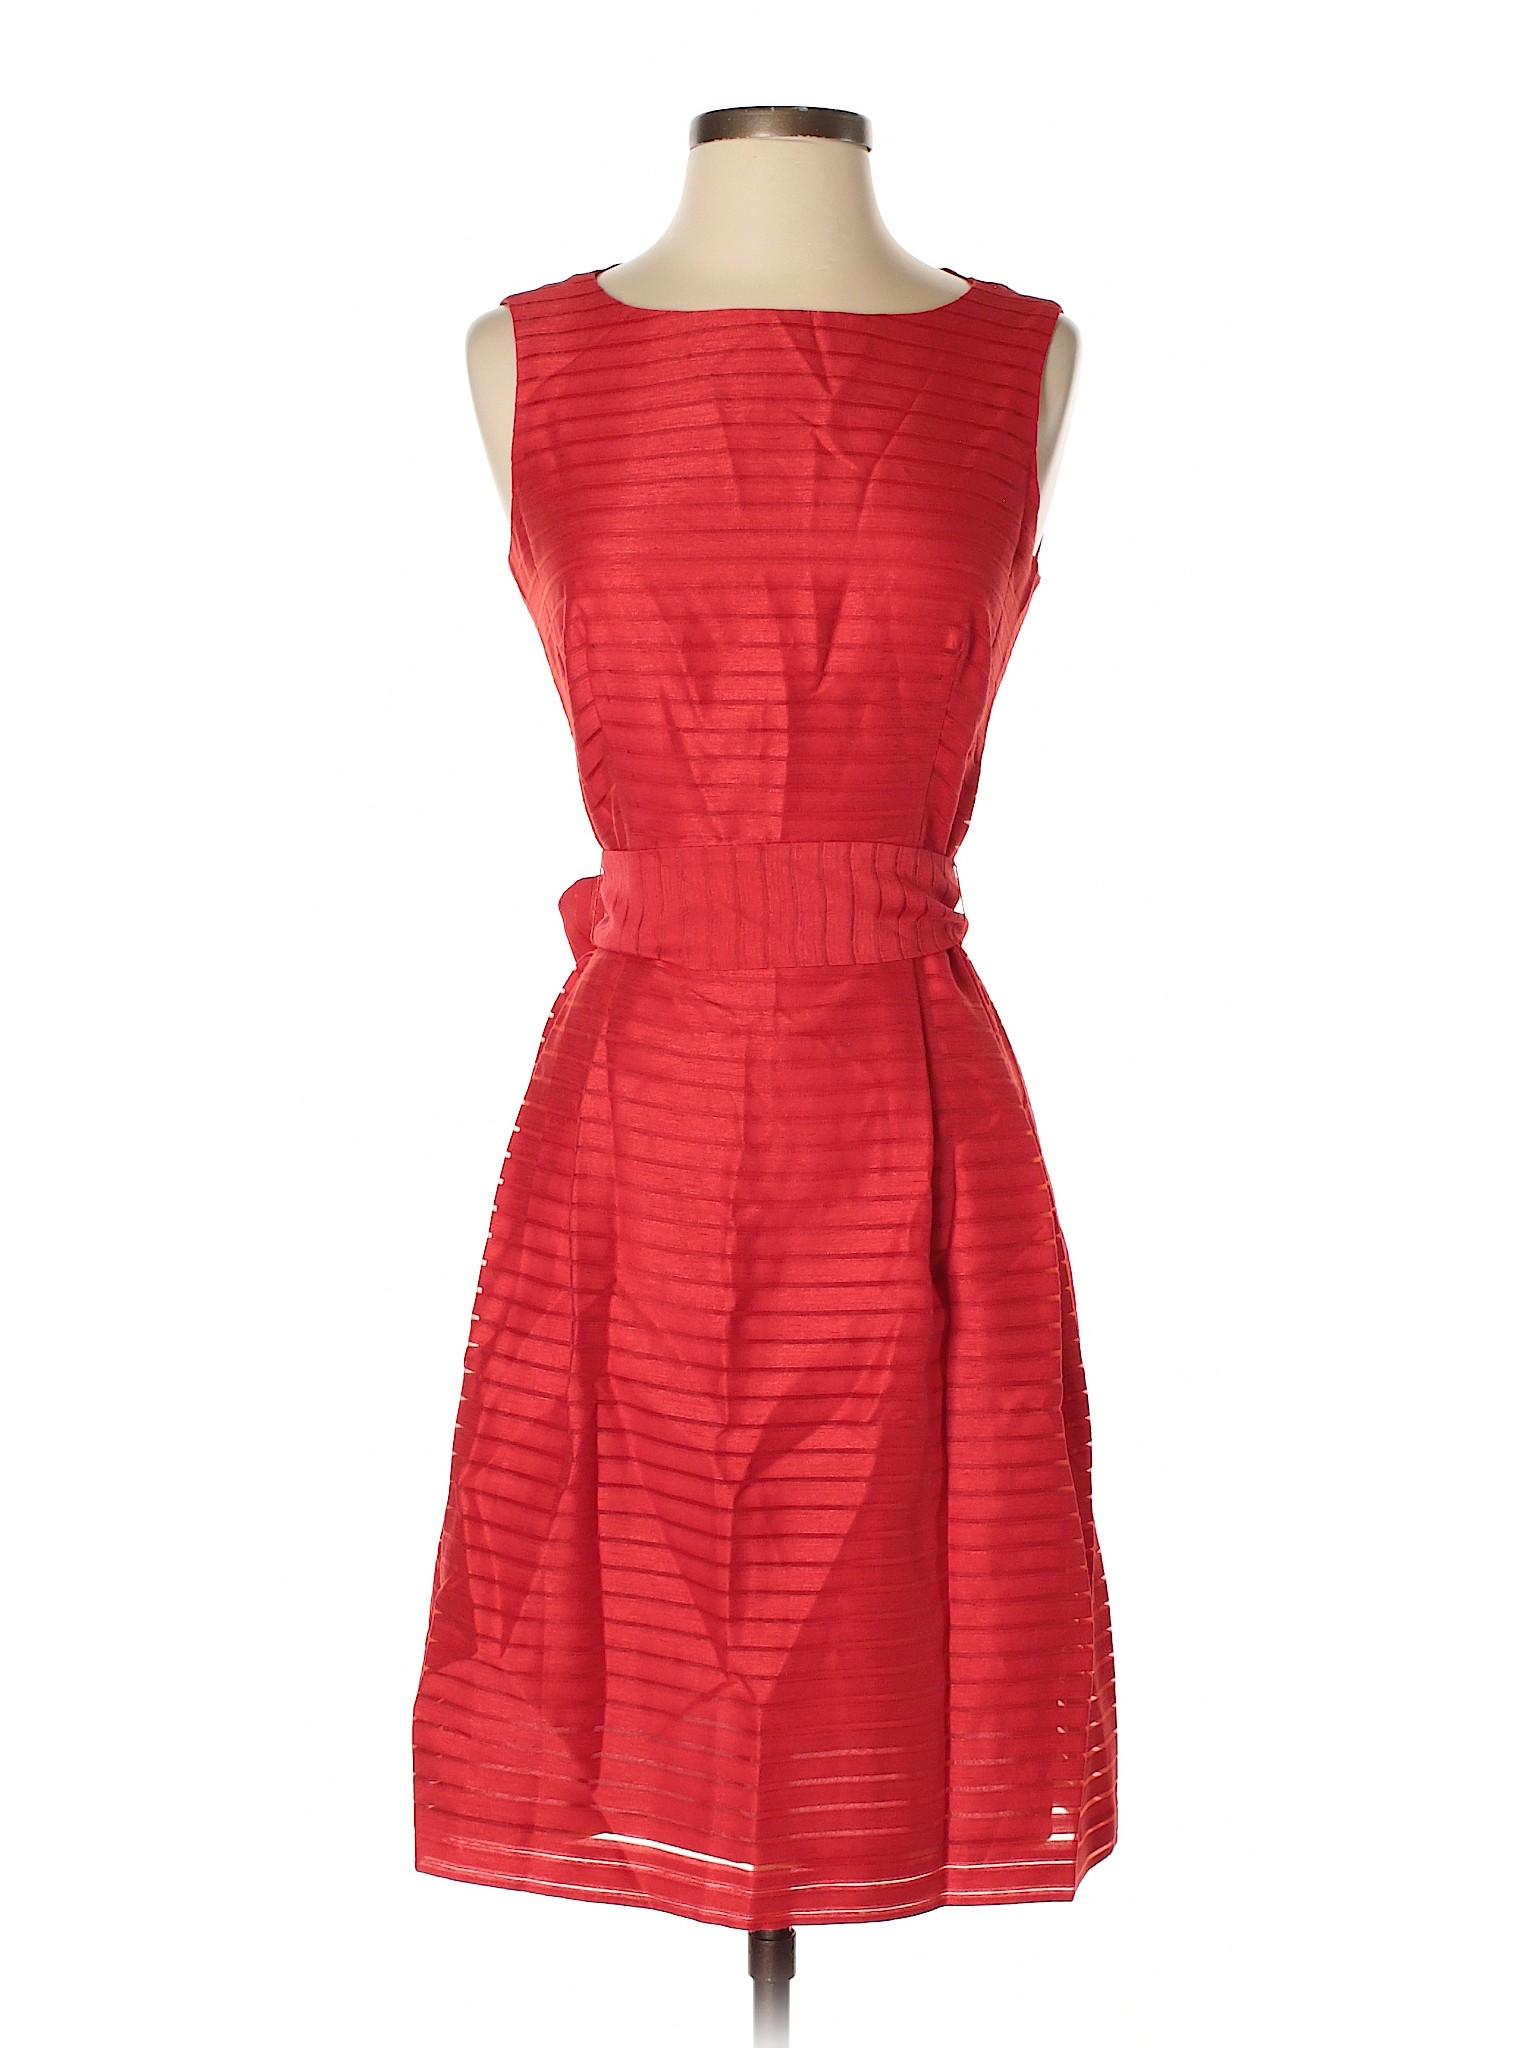 Casual Winter Klein Anne Dress Boutique qSwp6n